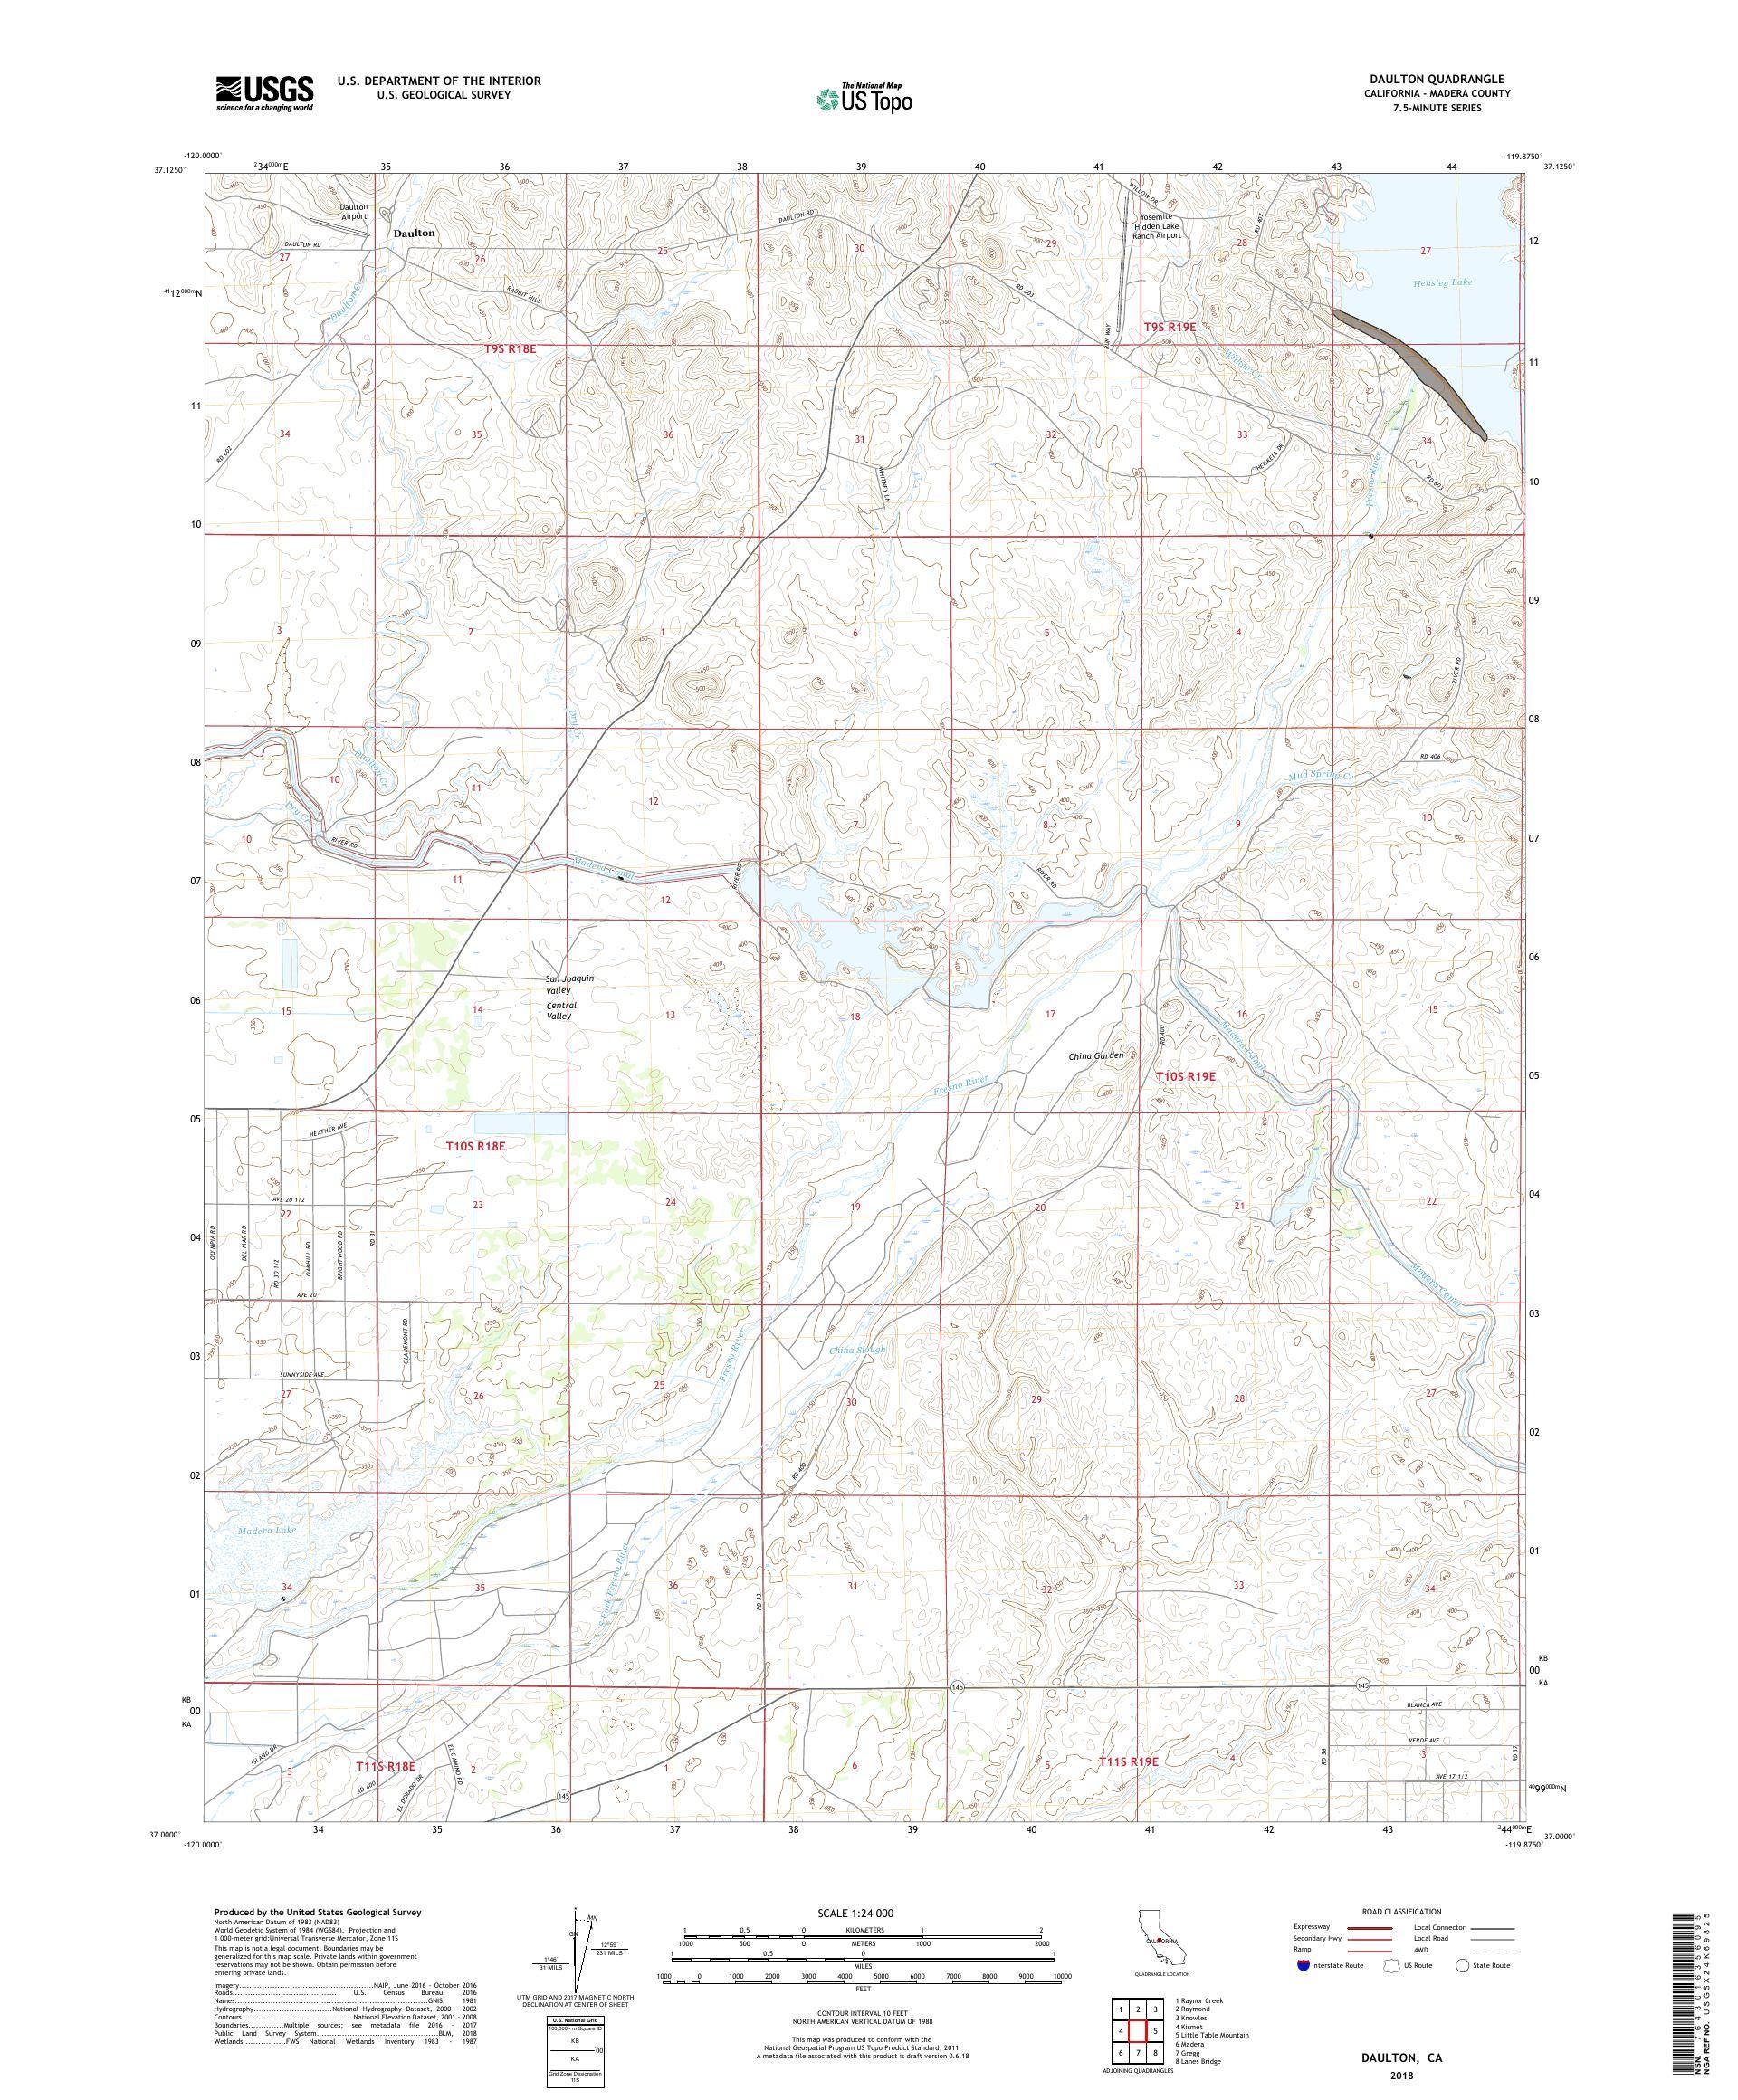 MyTopo Daulton, California USGS Quad Topo Map